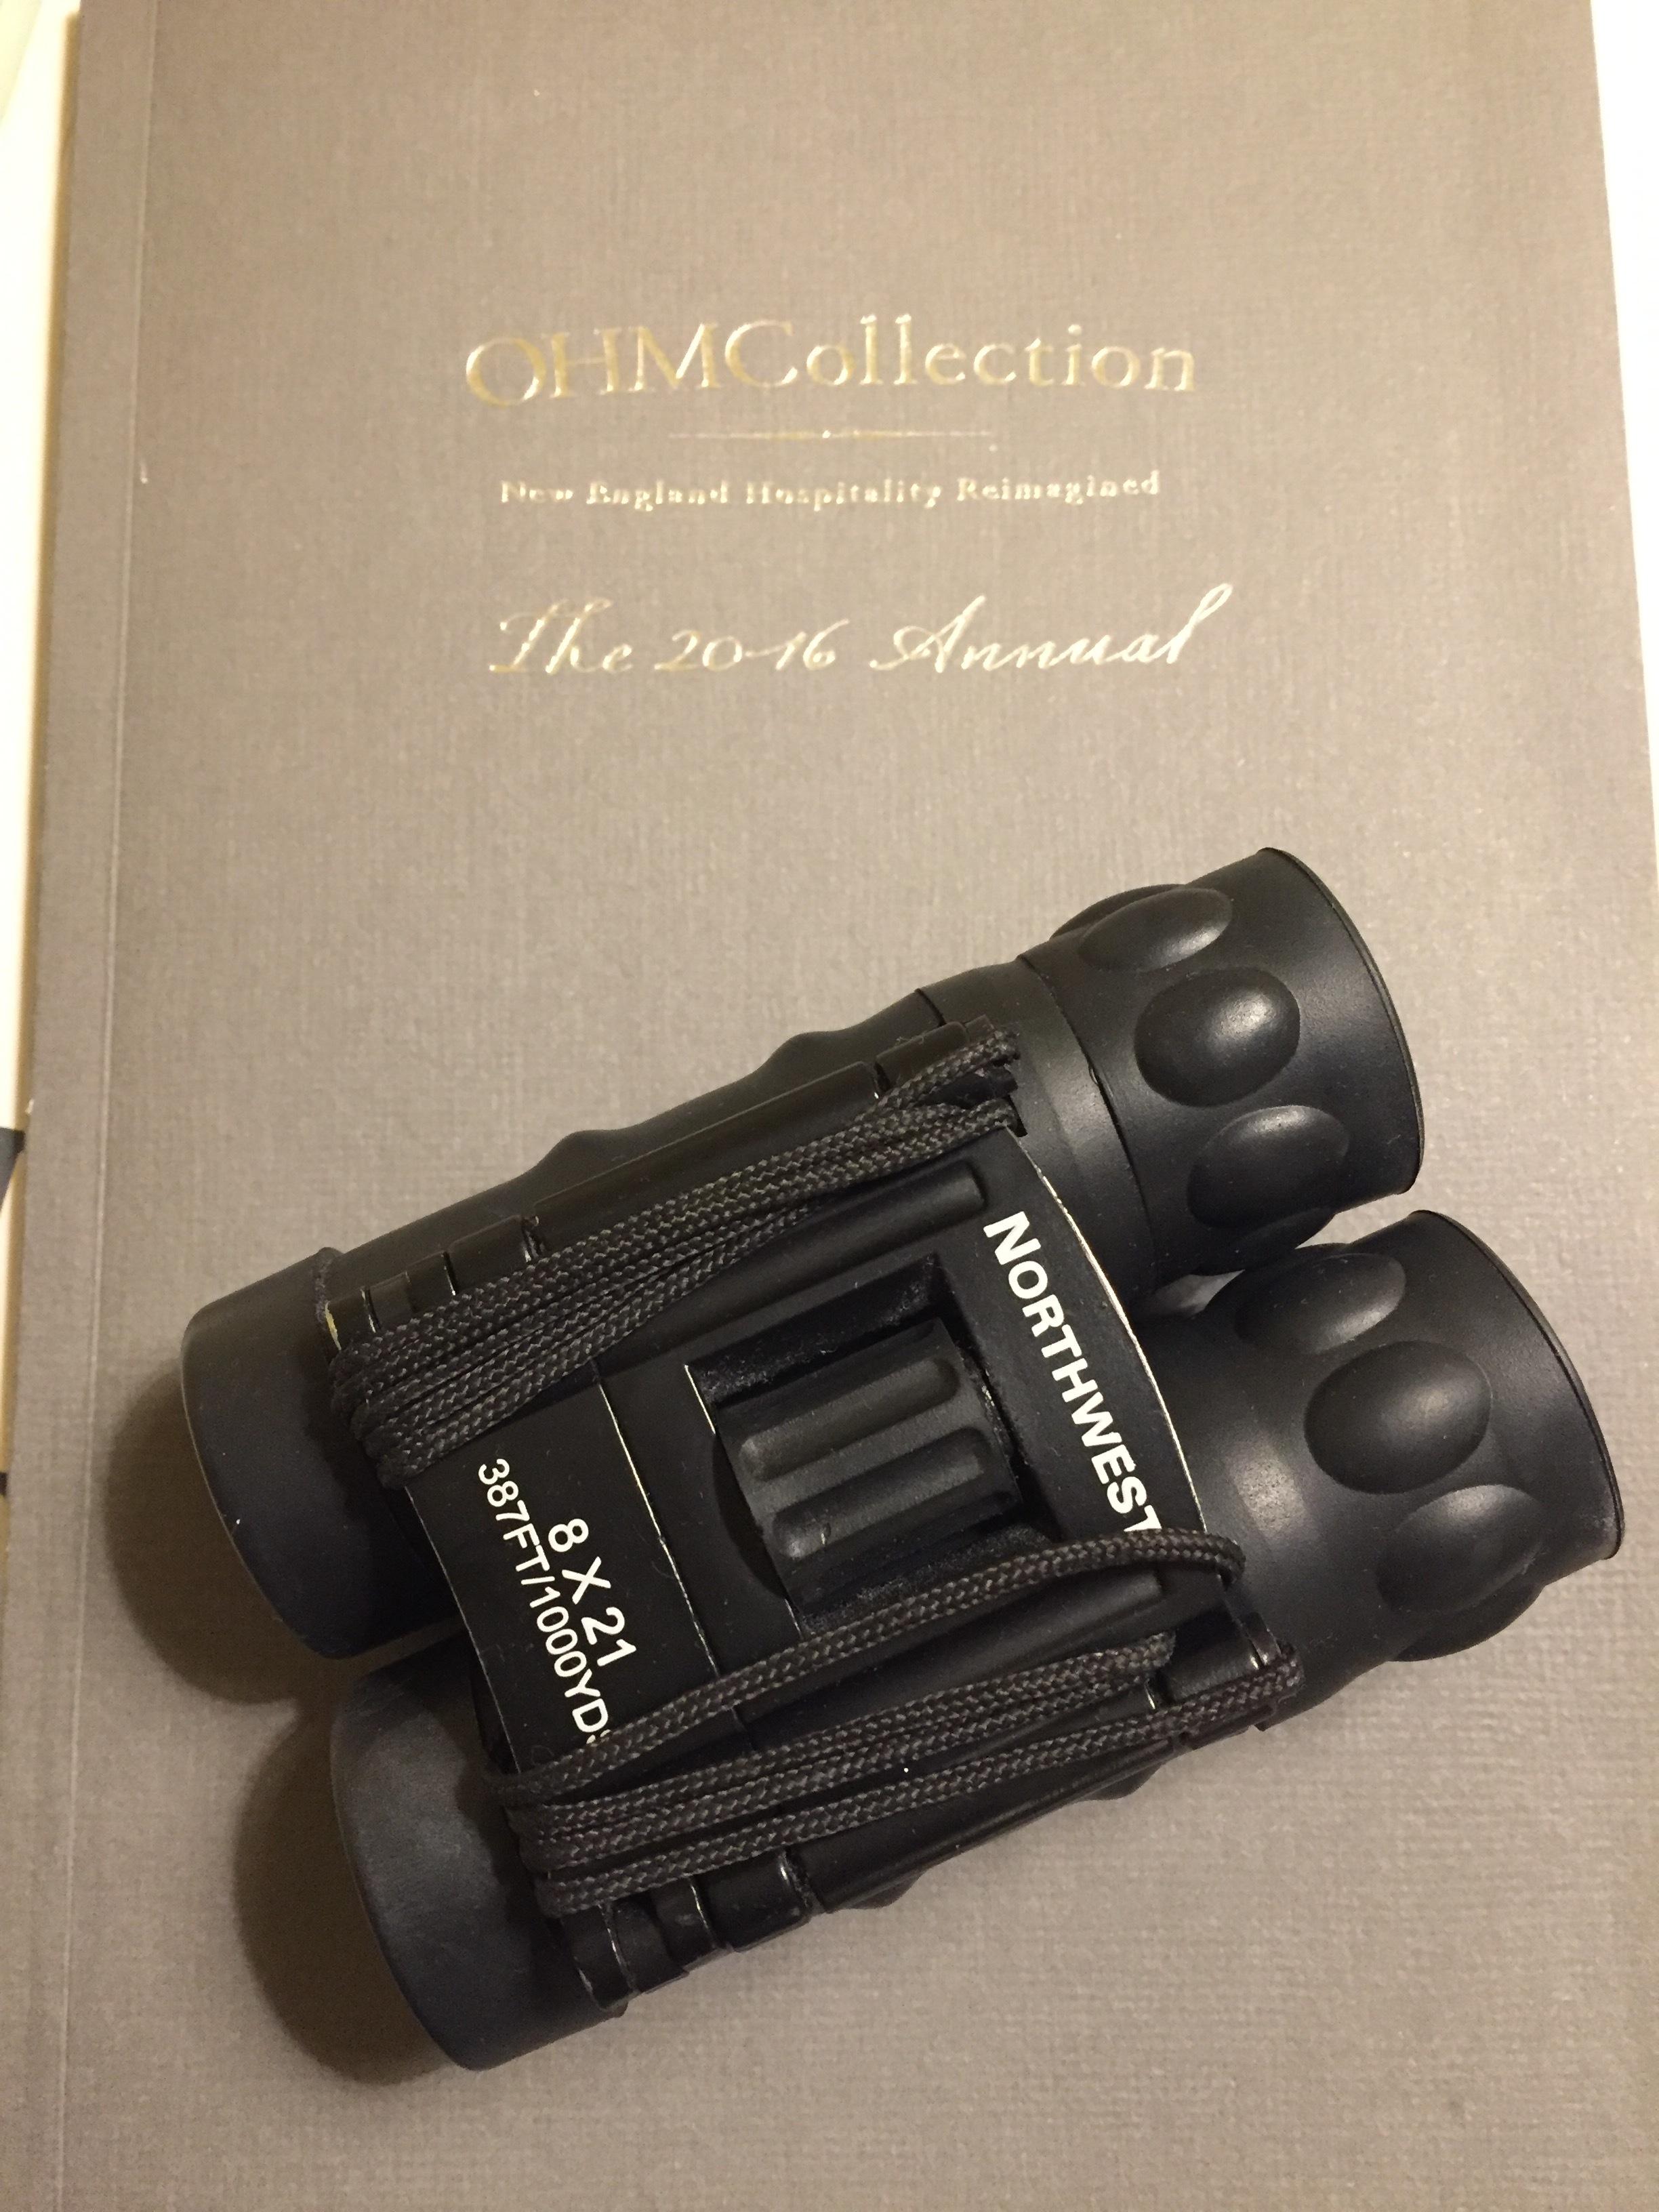 binoculars in room